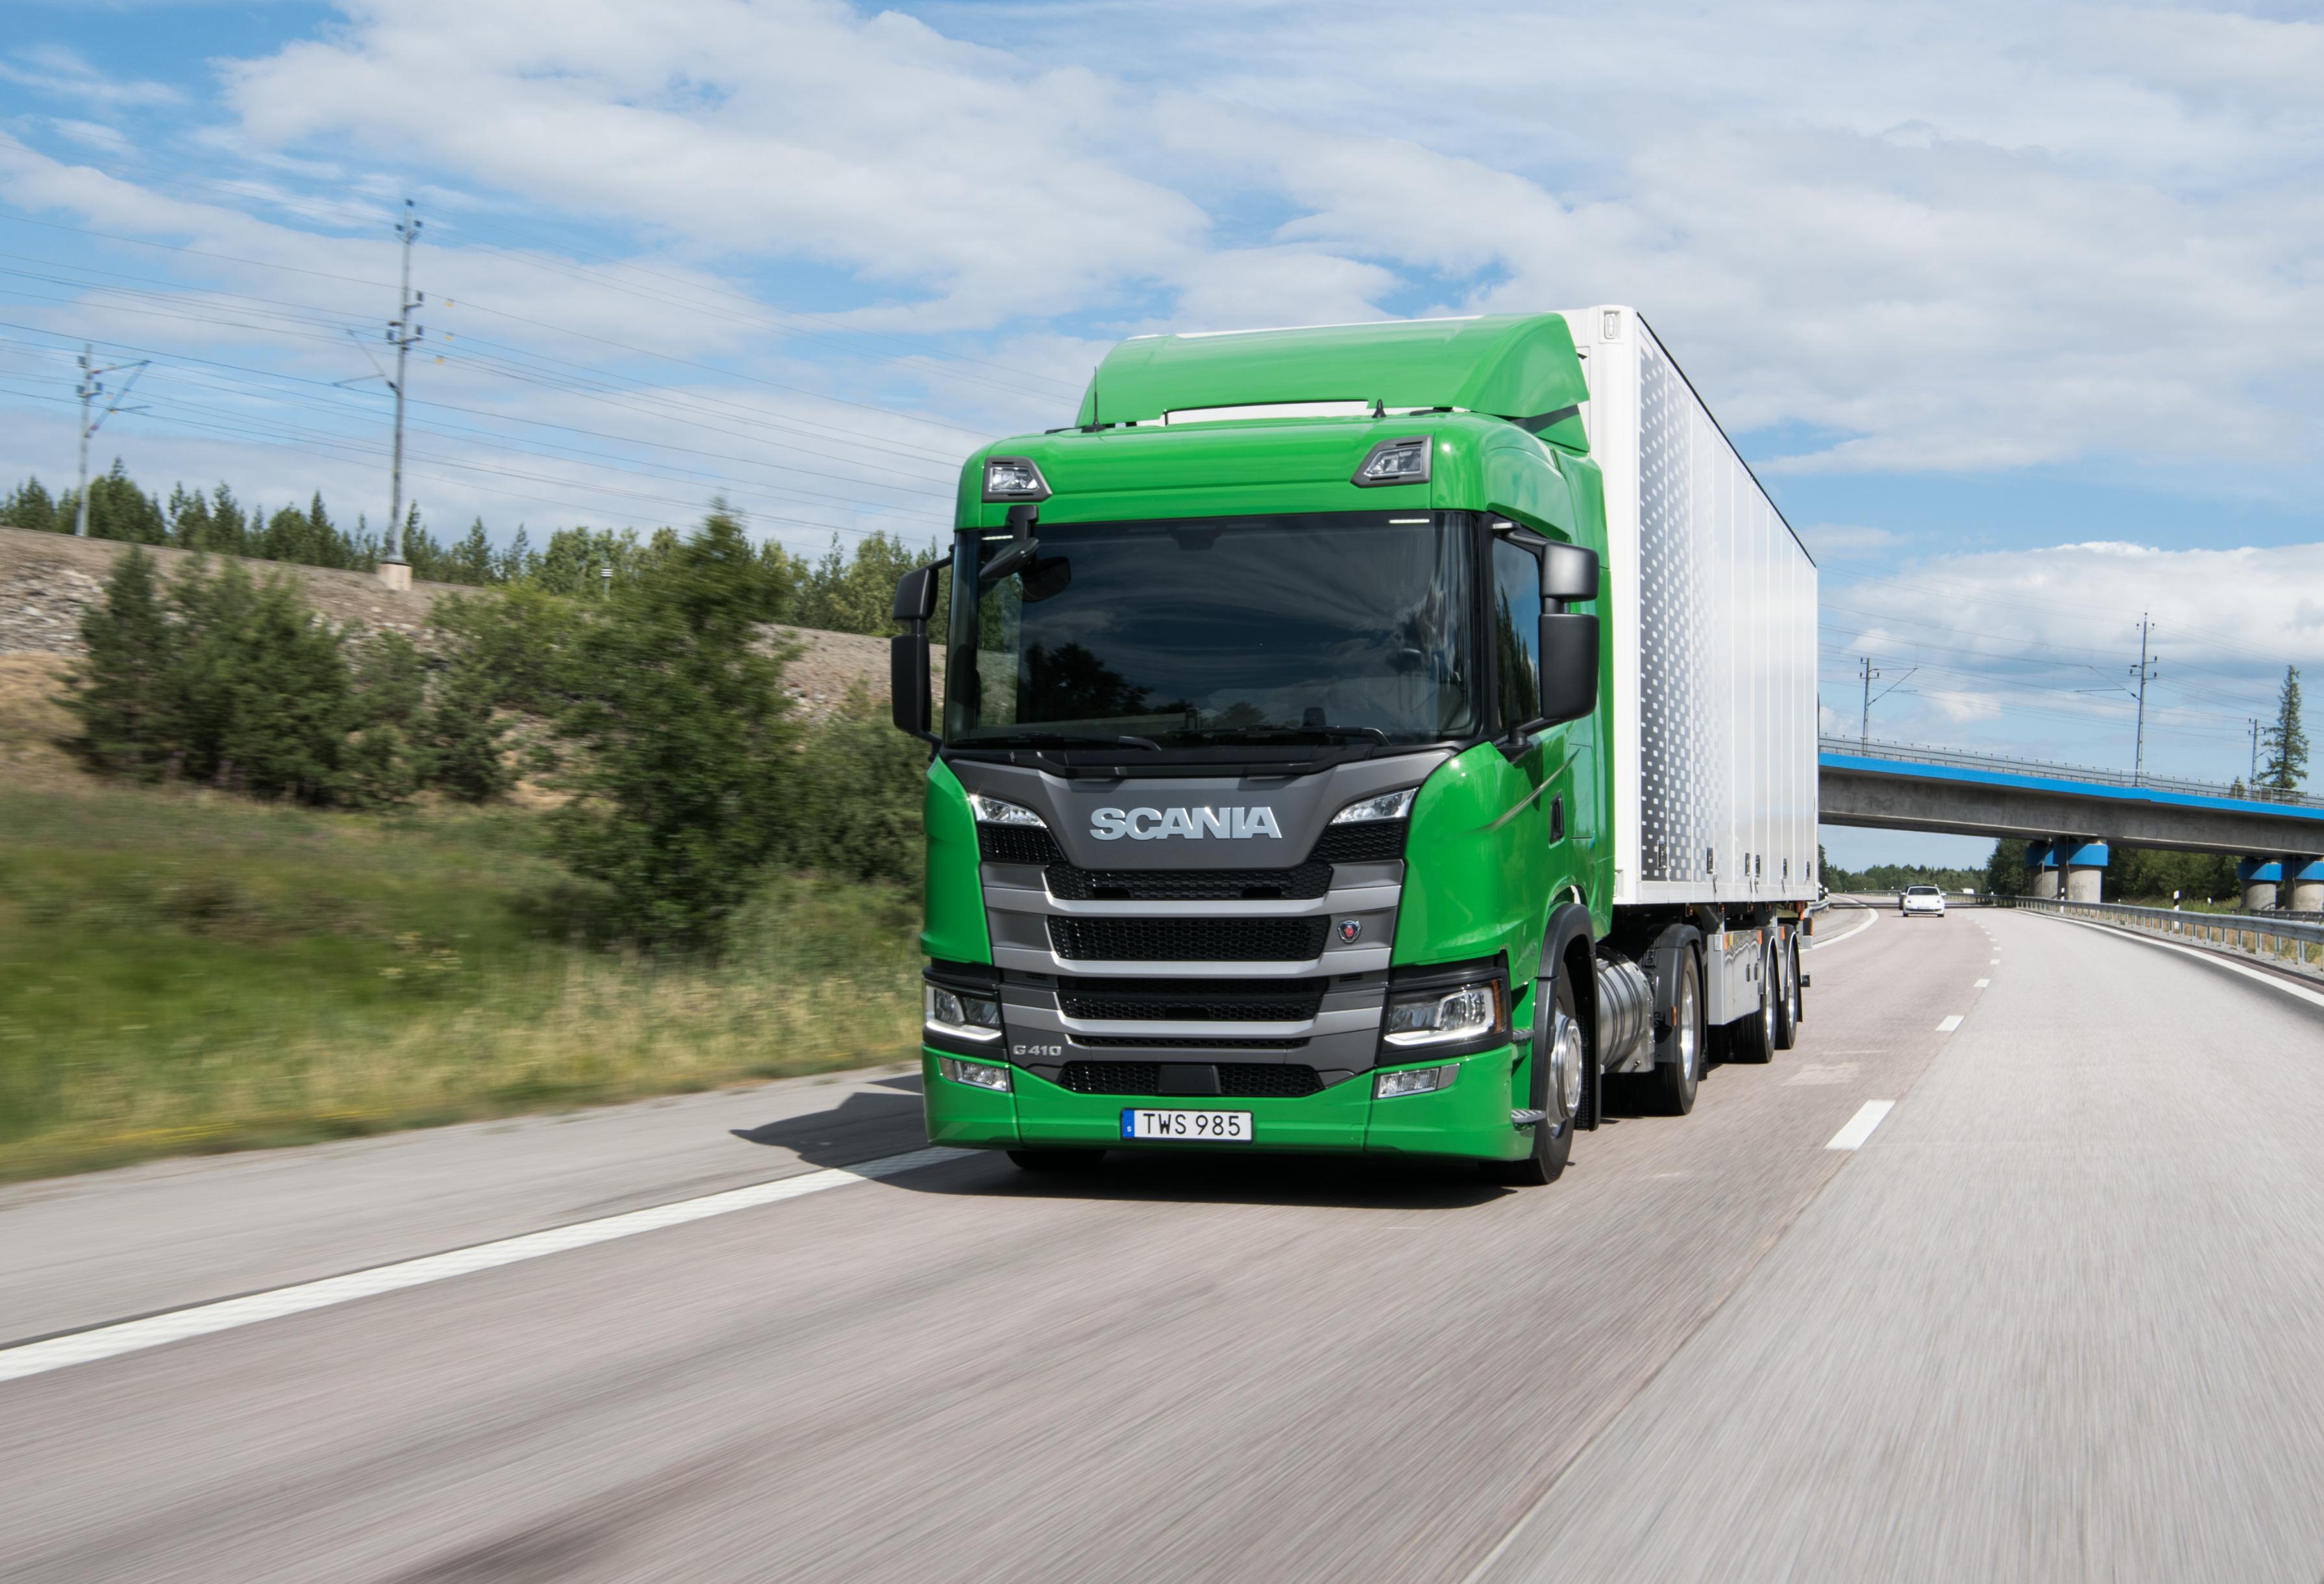 Image: Scania Denmark